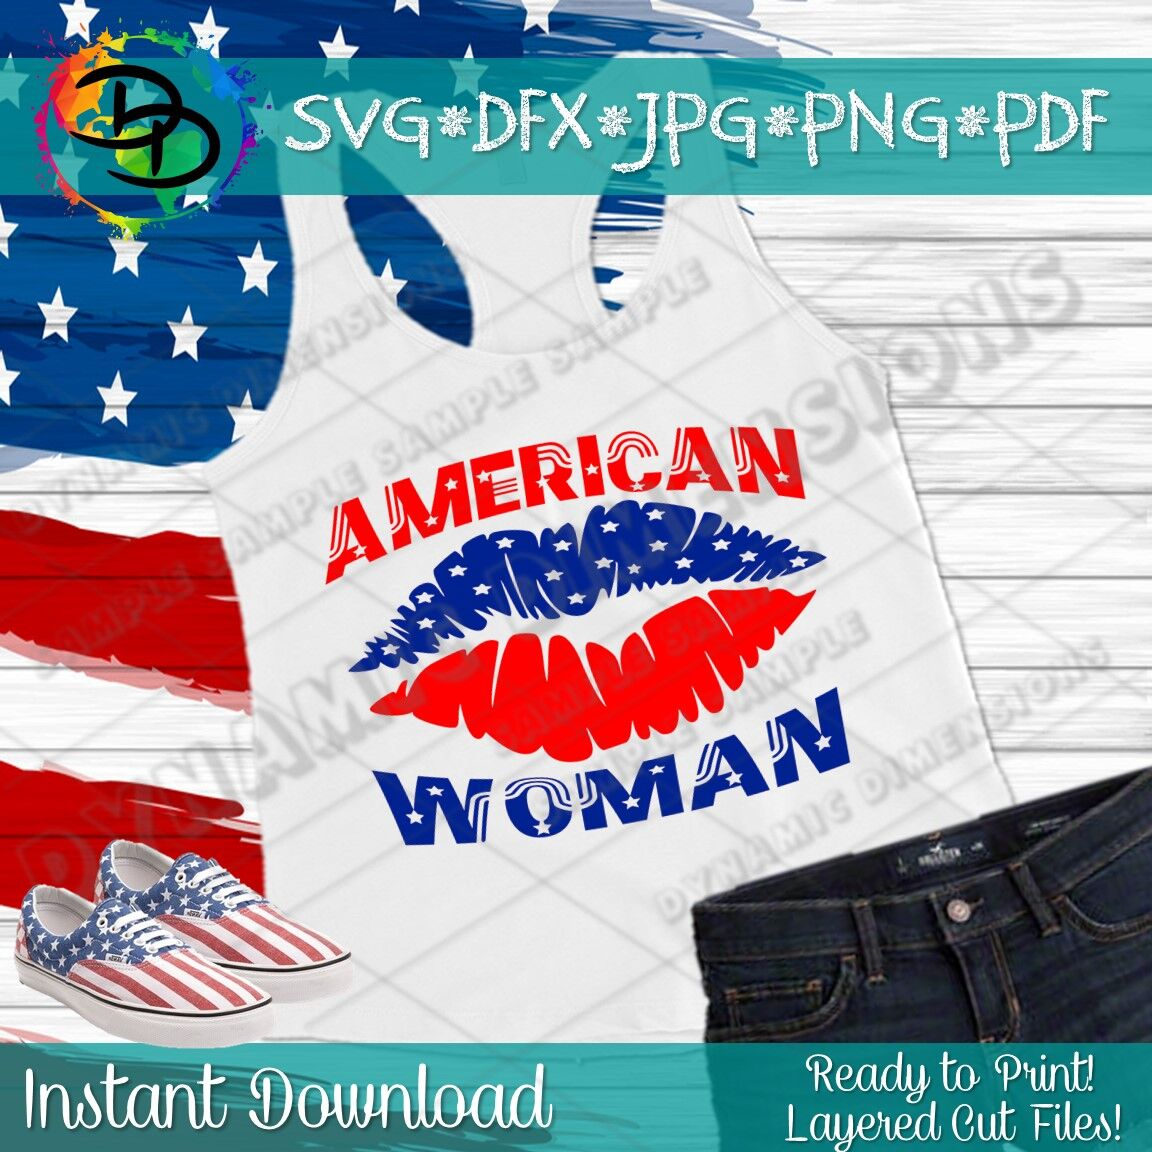 c0900ee132 American Woman svg, Patriotic Lips Svg, 4th of July Svg, American ...